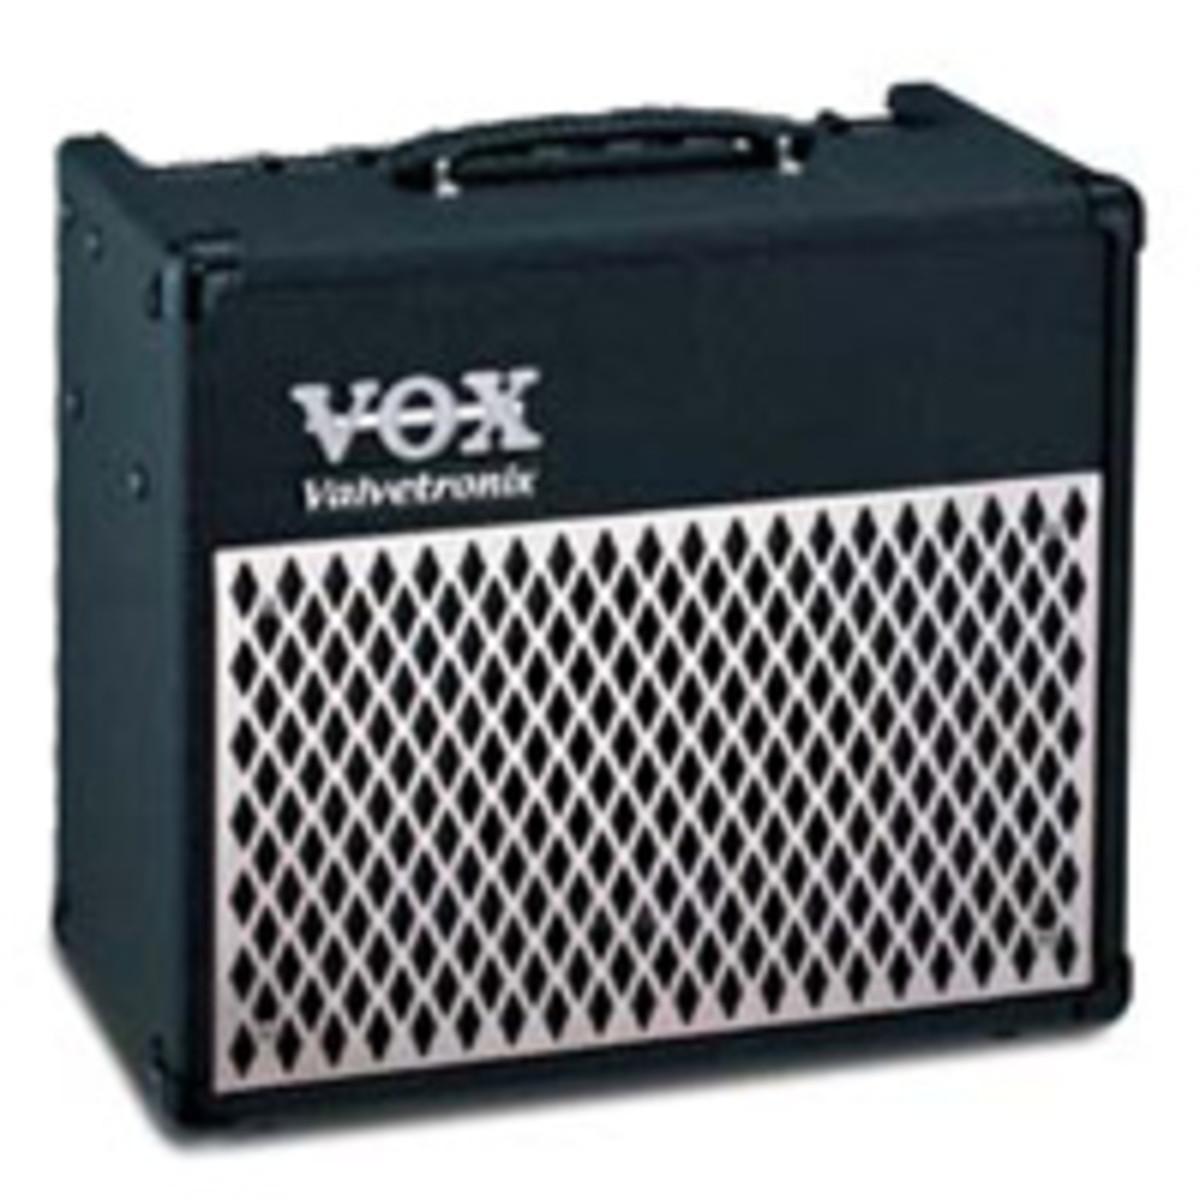 disc vox ad15vt valvetronix guitar amp at gear4music. Black Bedroom Furniture Sets. Home Design Ideas